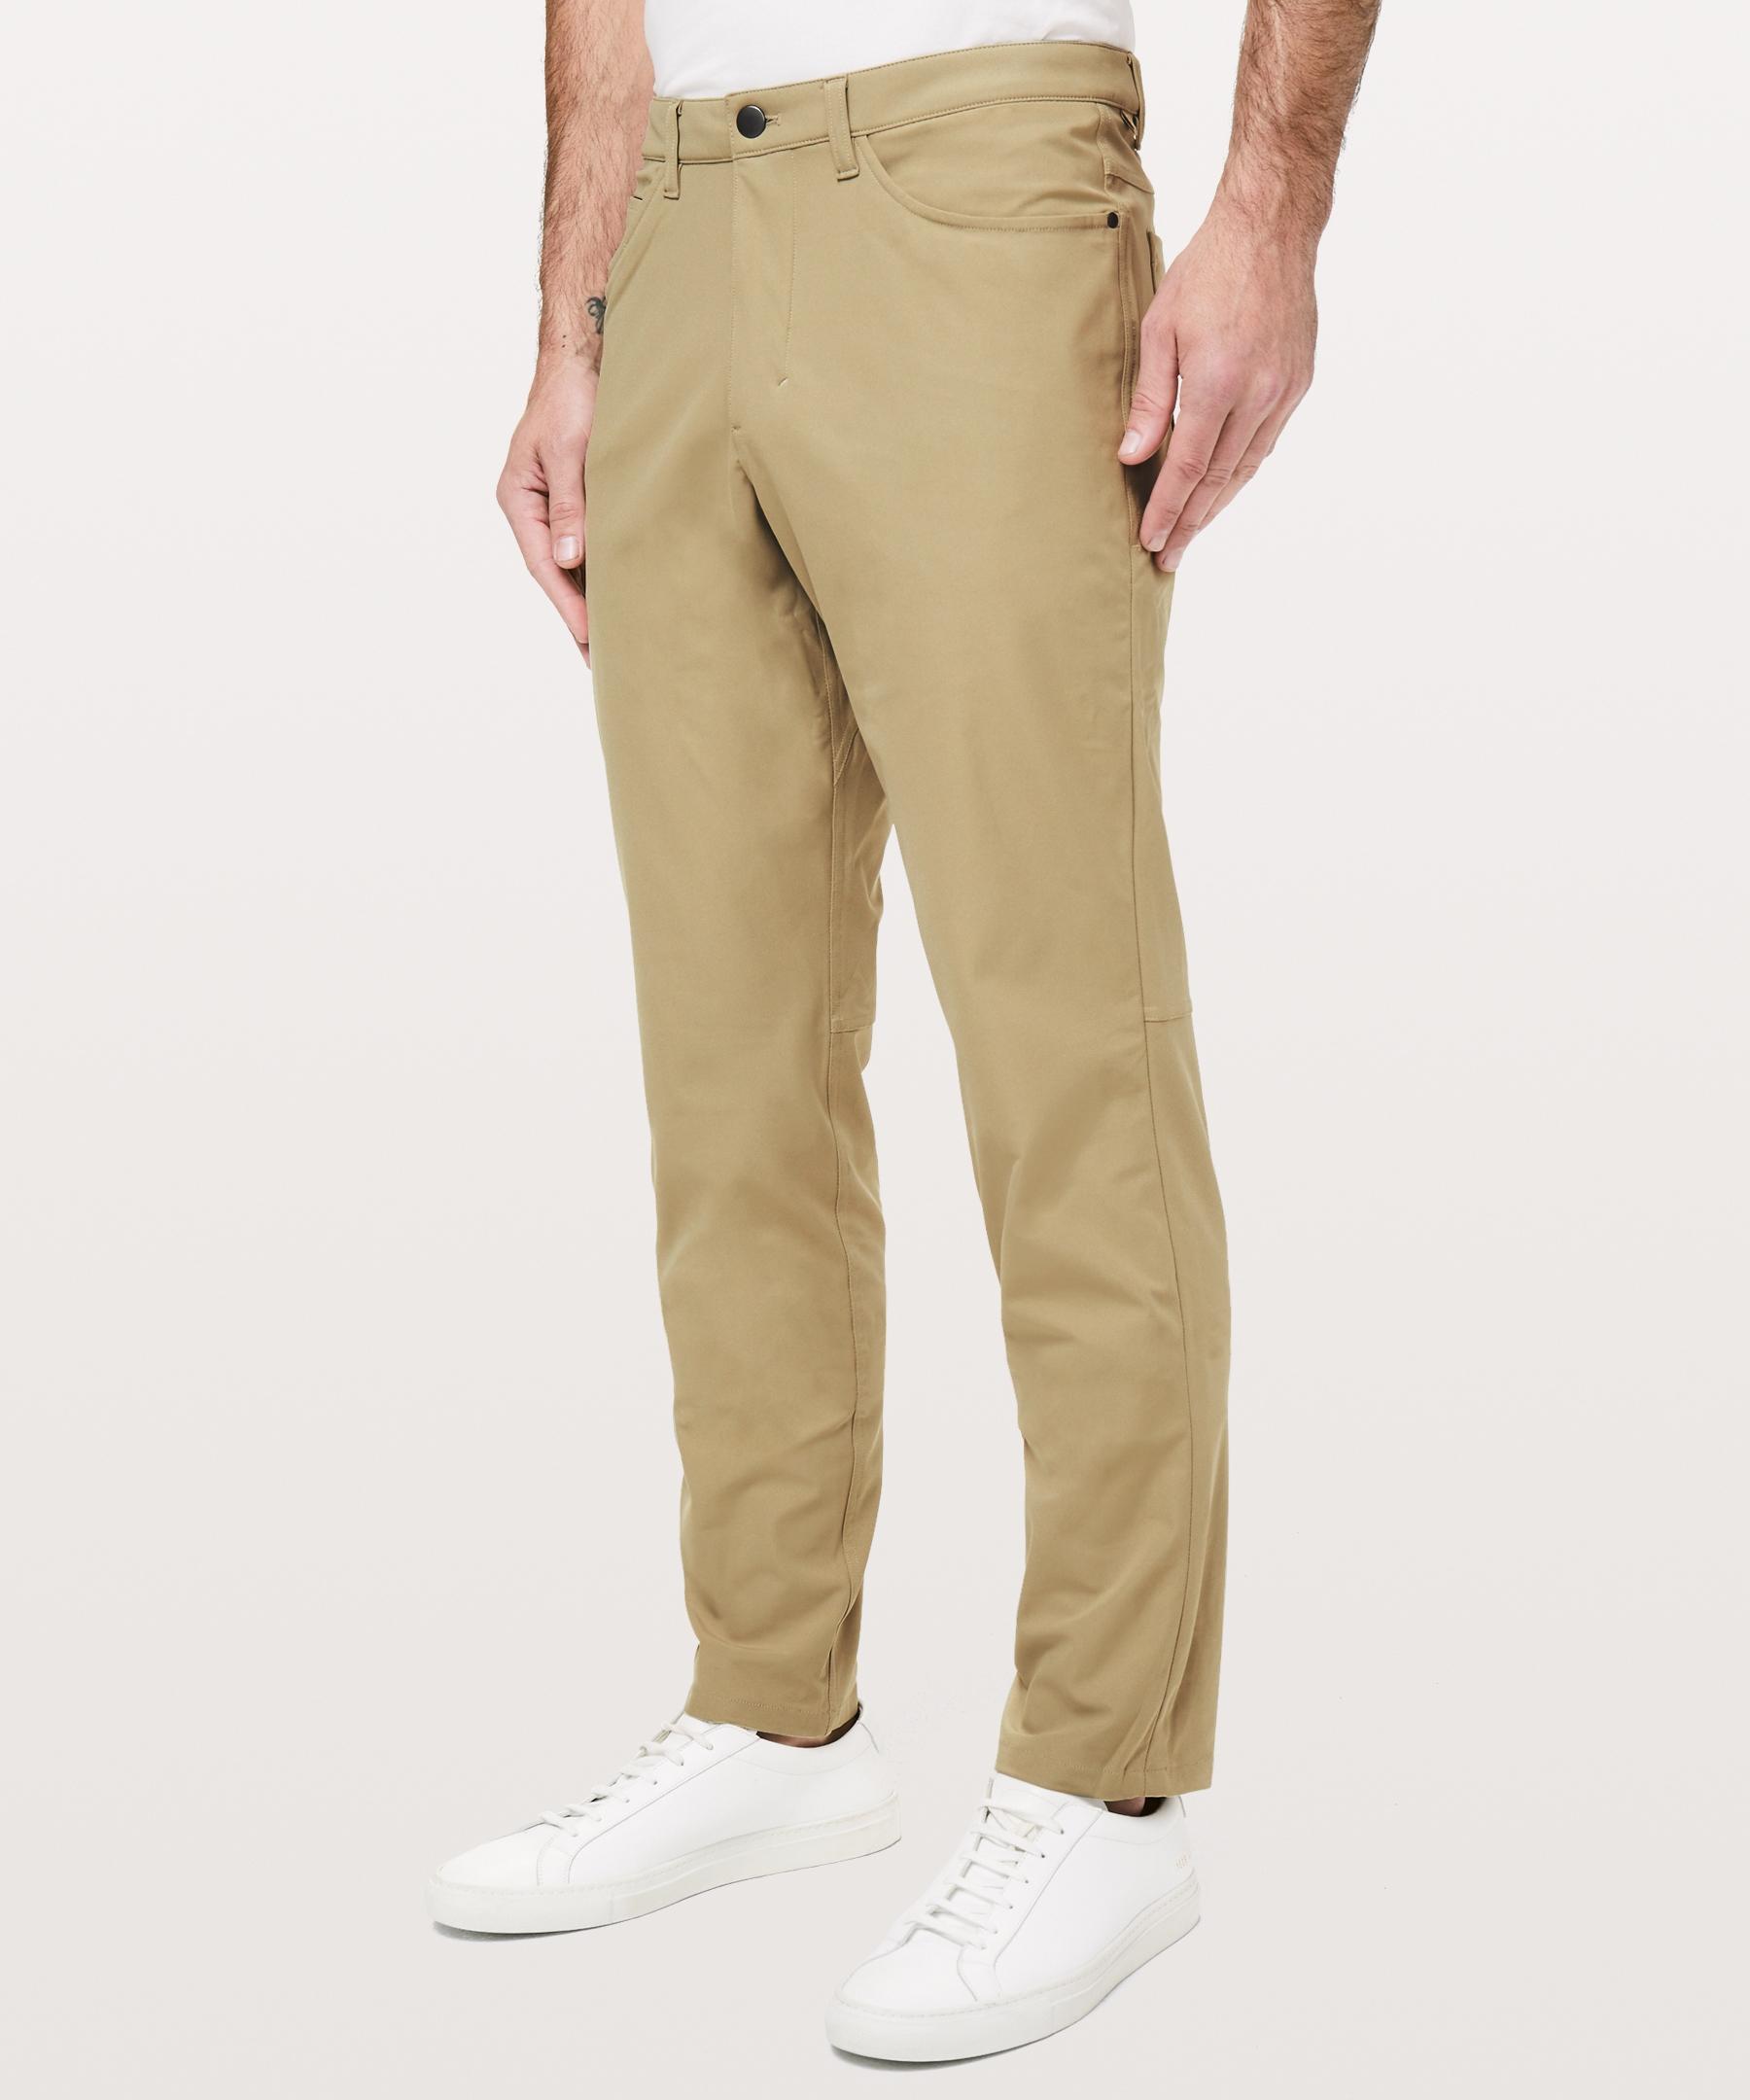 e7355cfd5066 lululemon Men s Abc Pant Classic 32